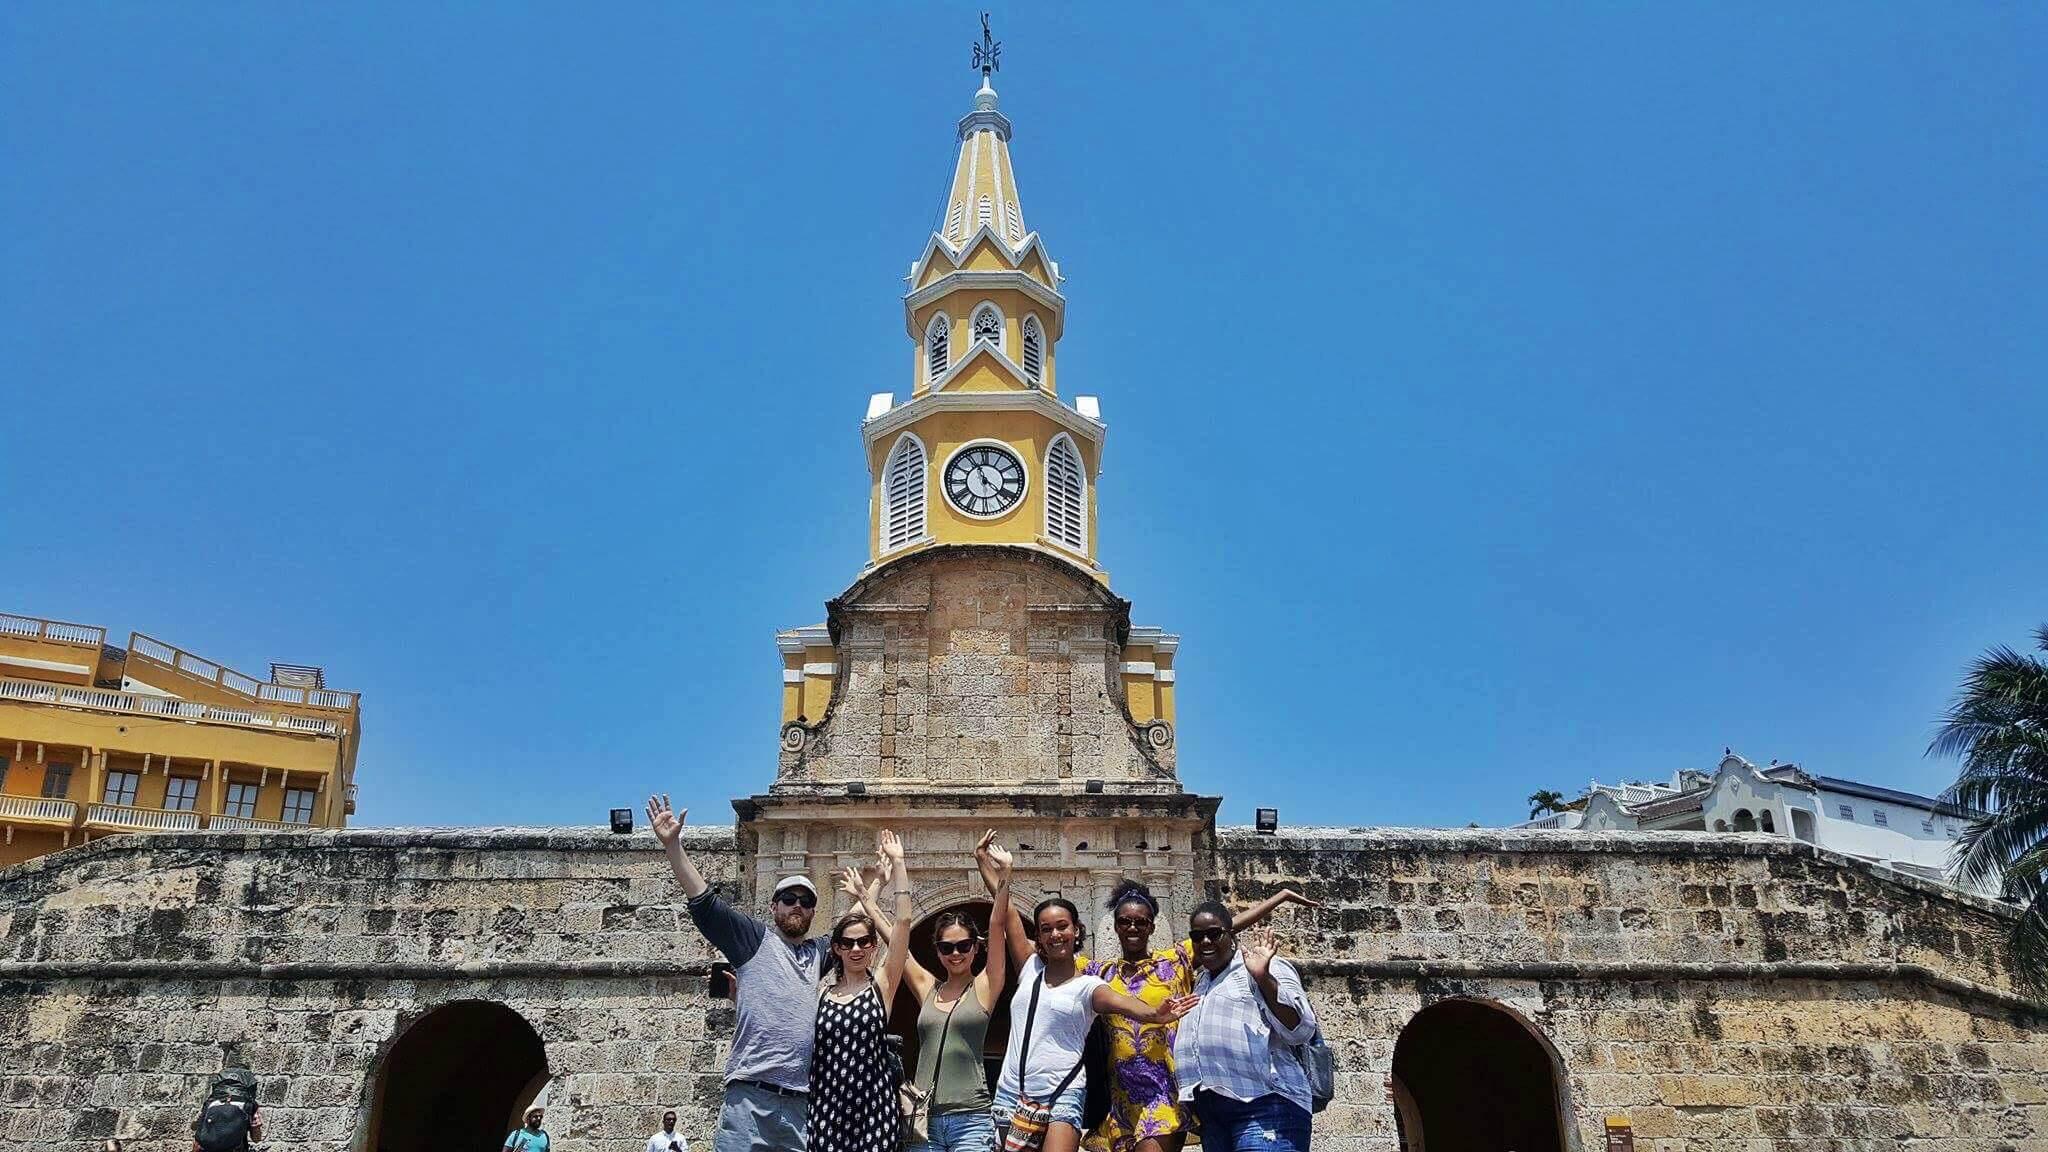 cartagena-colombia-ochristine-retreats-group-travel-diverse